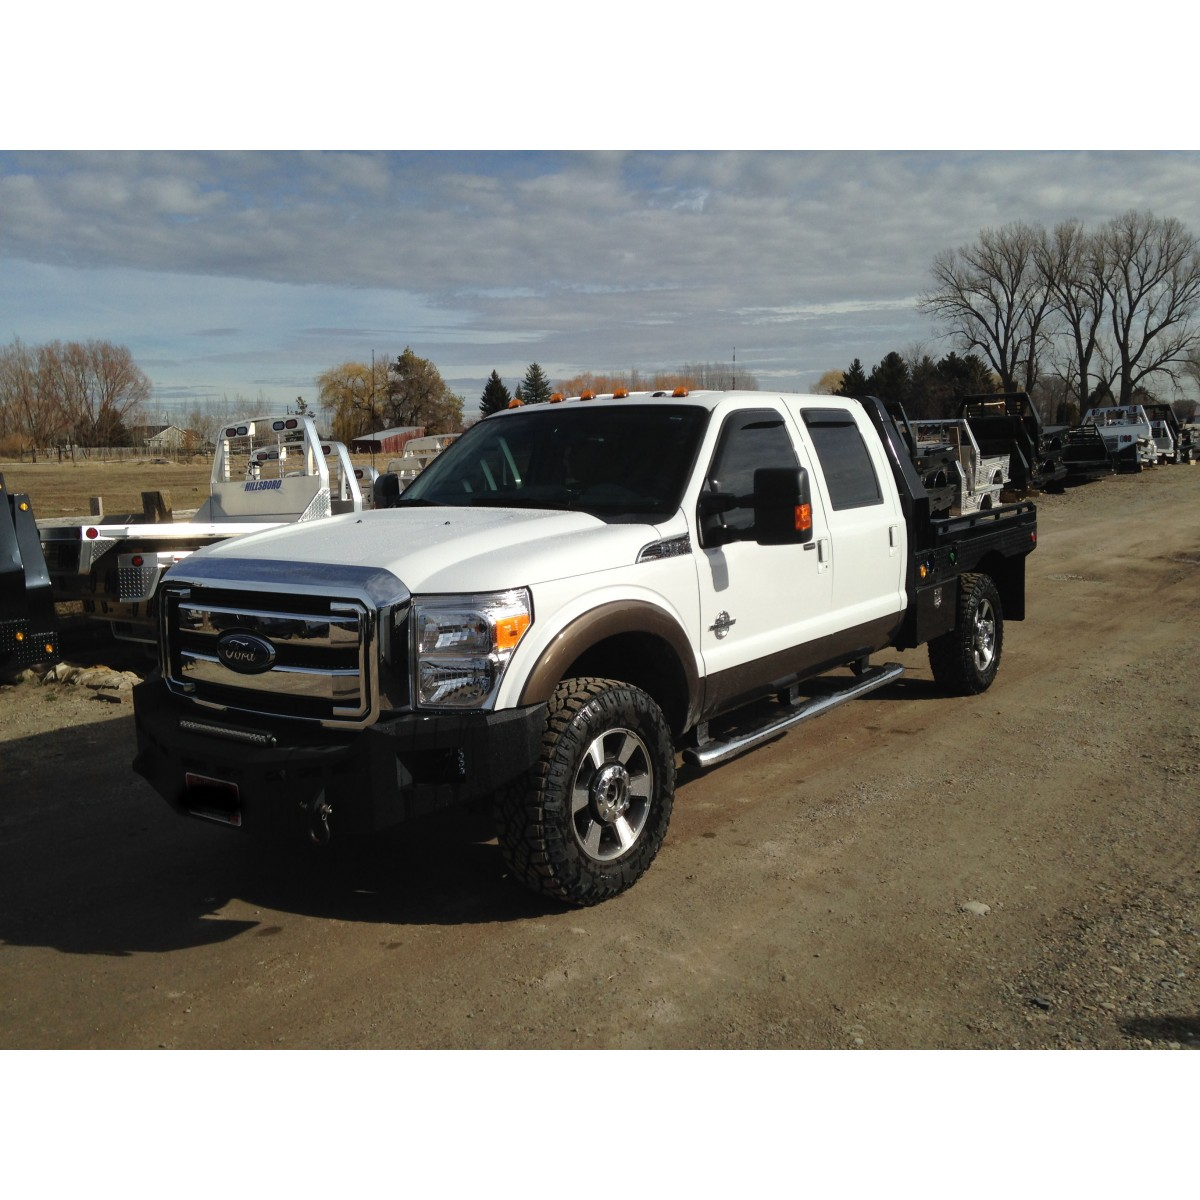 Flatbed Tow Truck >> Hillsboro GII Steel Bed - G II Steel Bed - Hillsboro ...